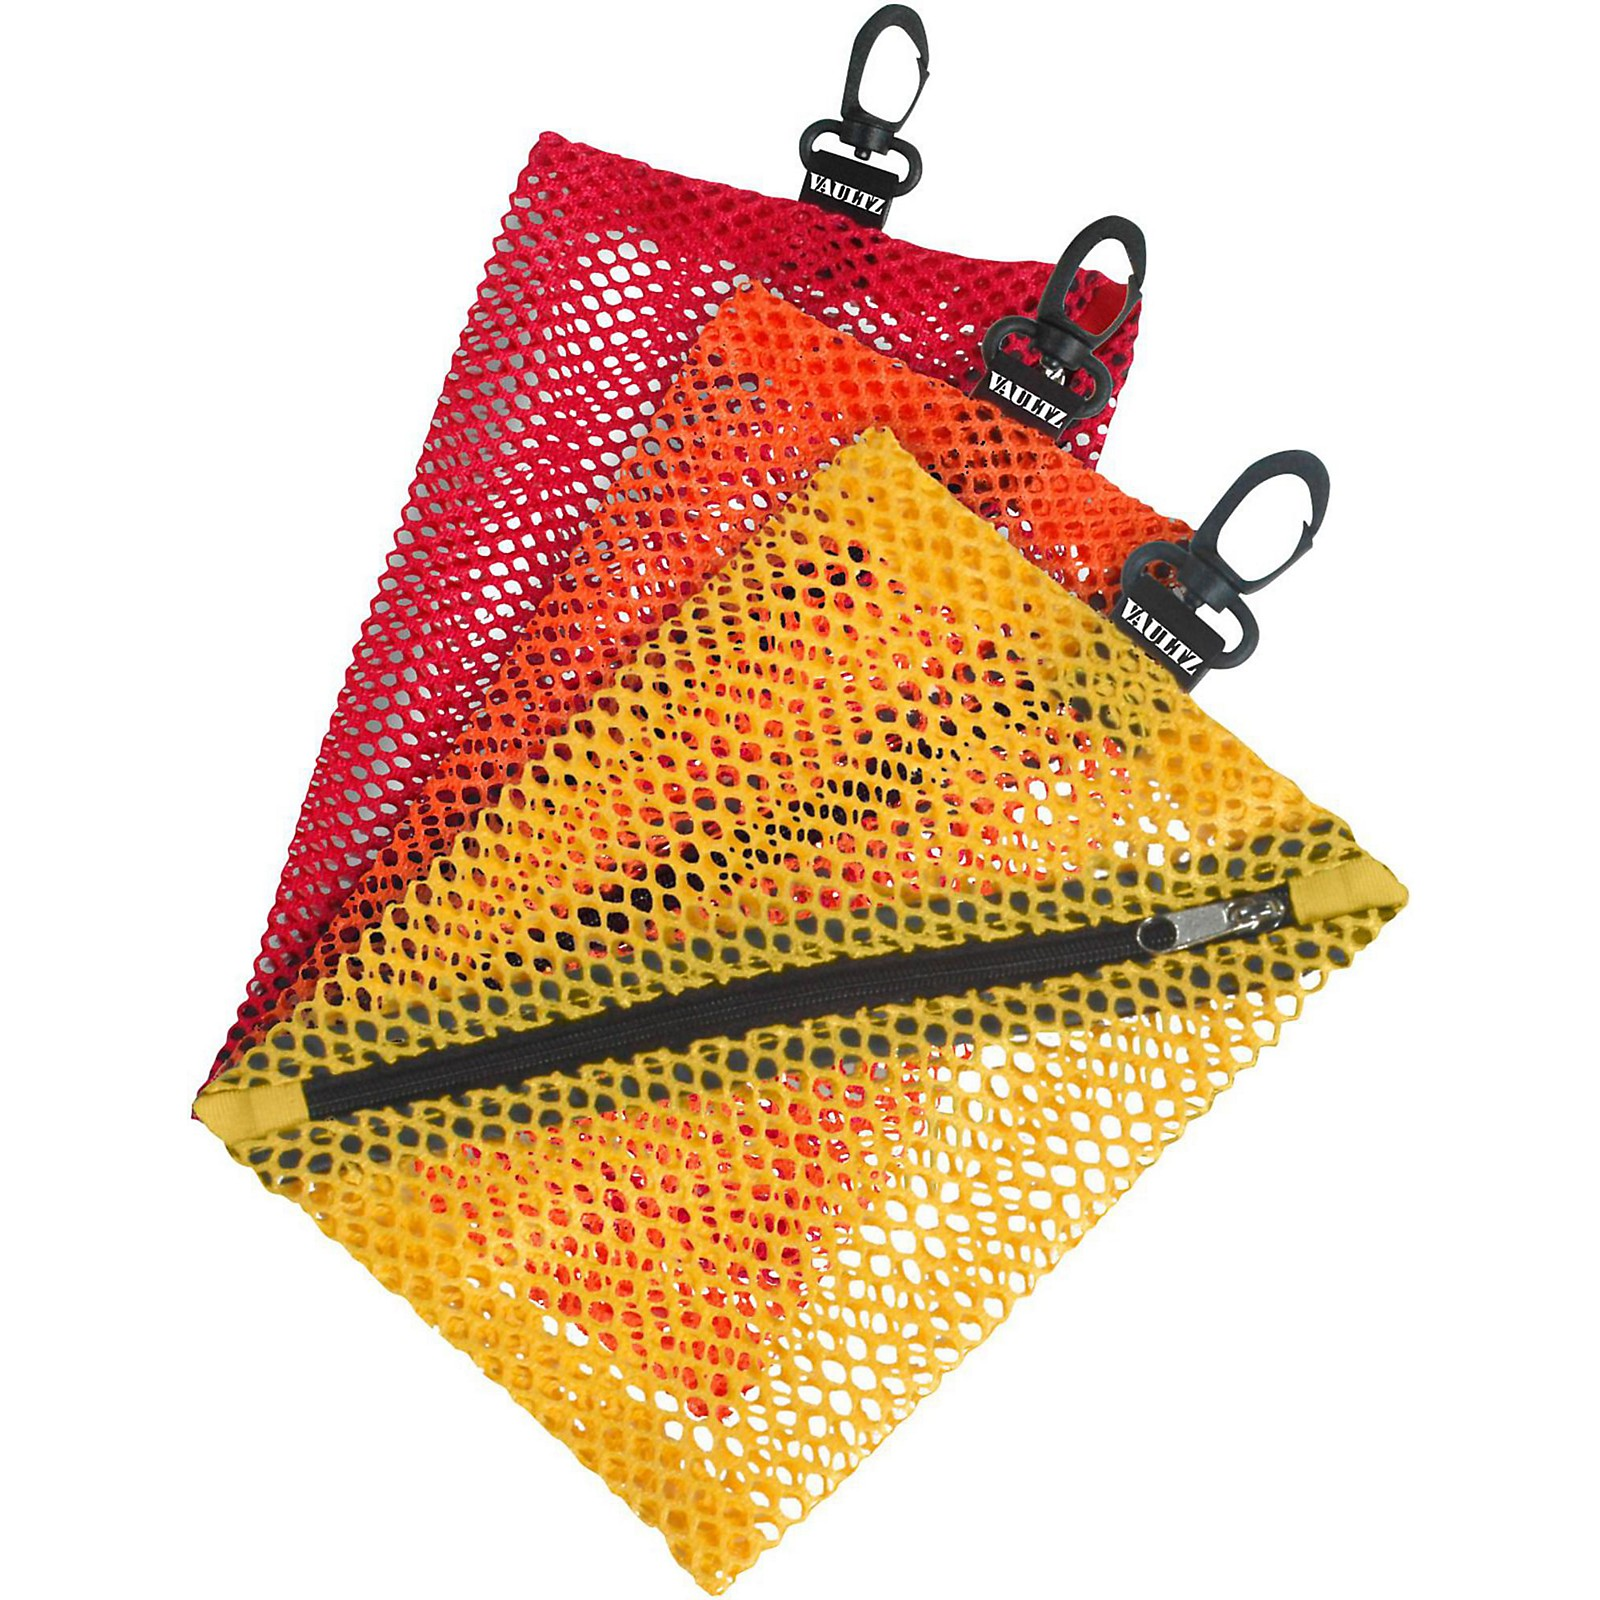 Vaultz Mesh Bag 3-Pack